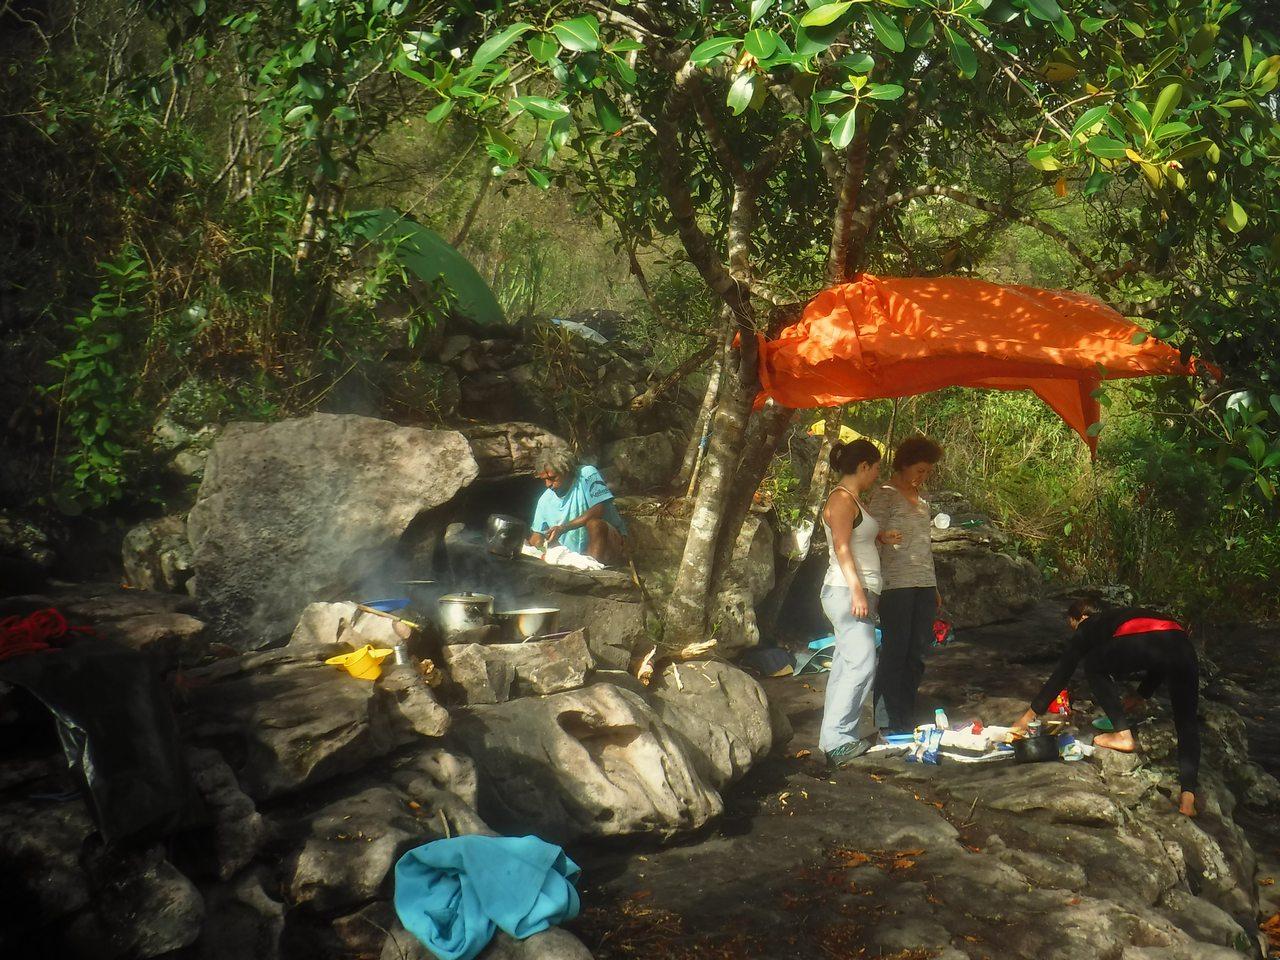 Acampamento Poção, trekking Mixila, Chapada Diamantina, Brazil